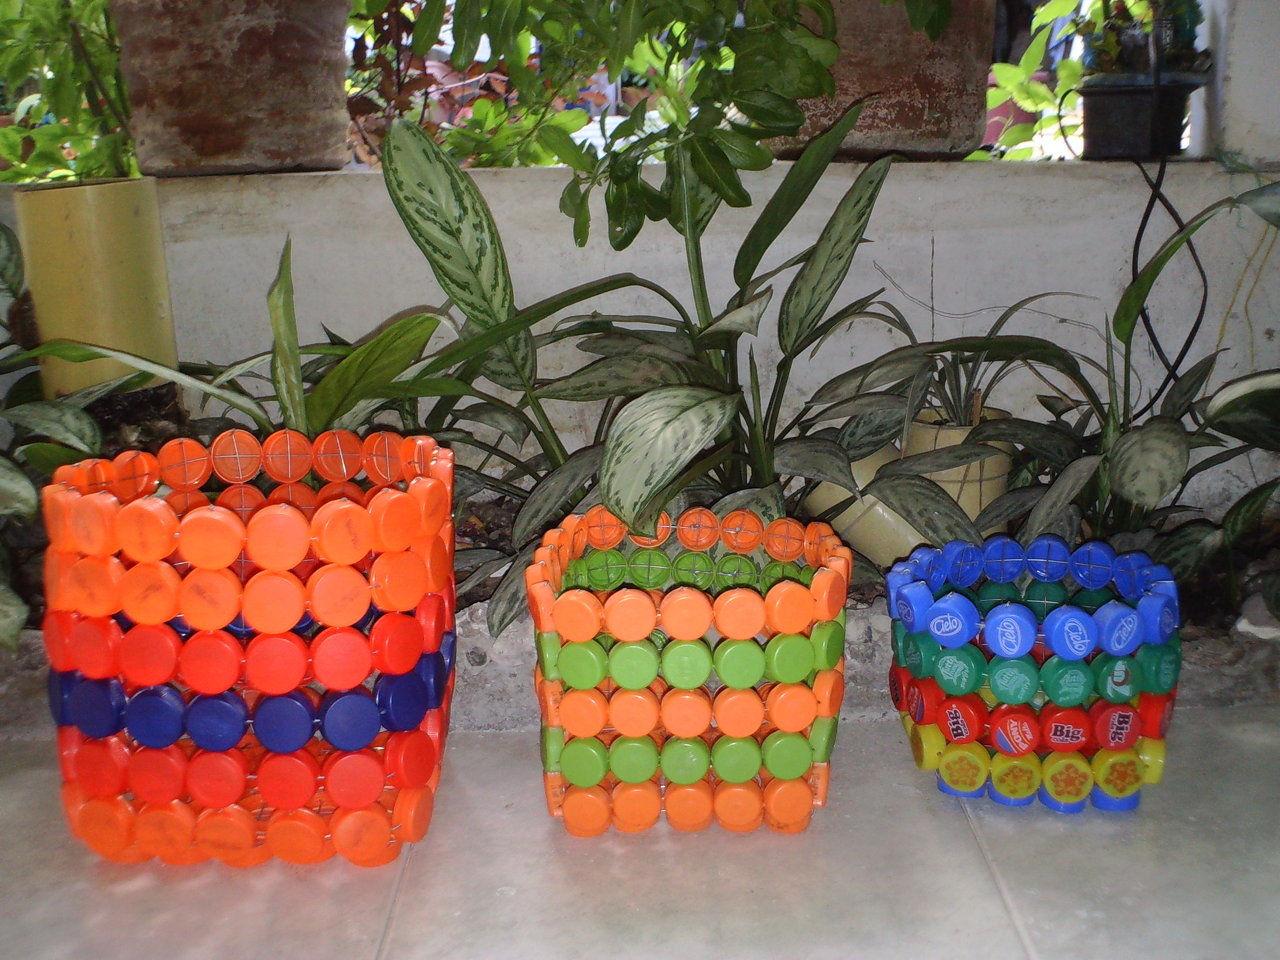 Canastas created by reciclarte36 based on my lil for Tapas de plastico